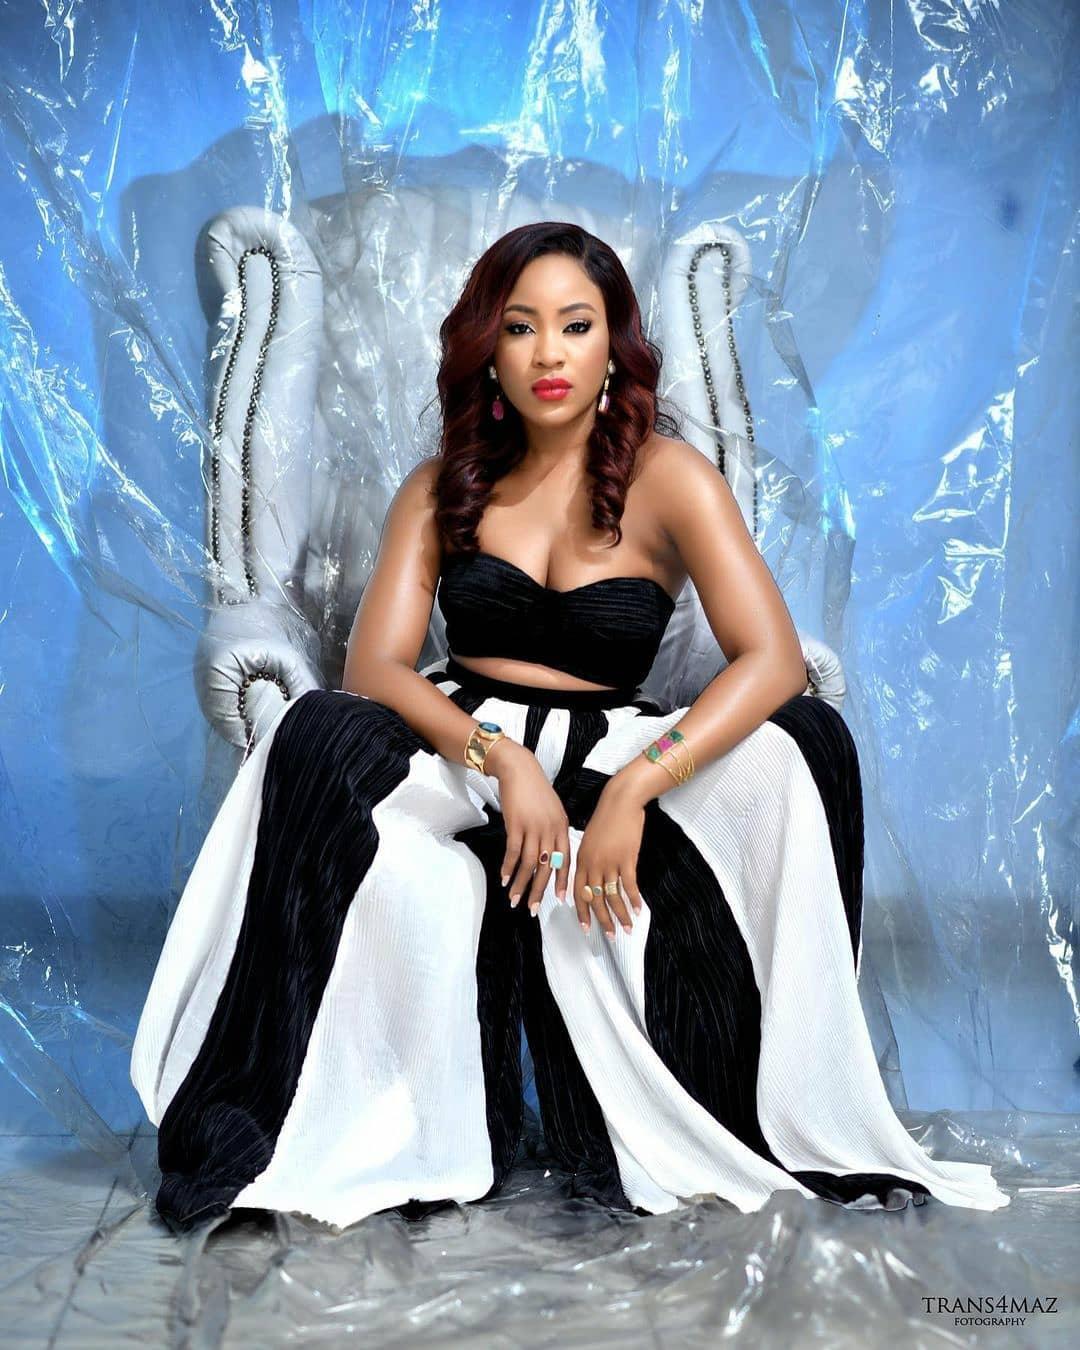 BellaNaija Style's Best Dressed of the Week: Erica Nlewedim, Julitha Kabete, Denola Grey & More